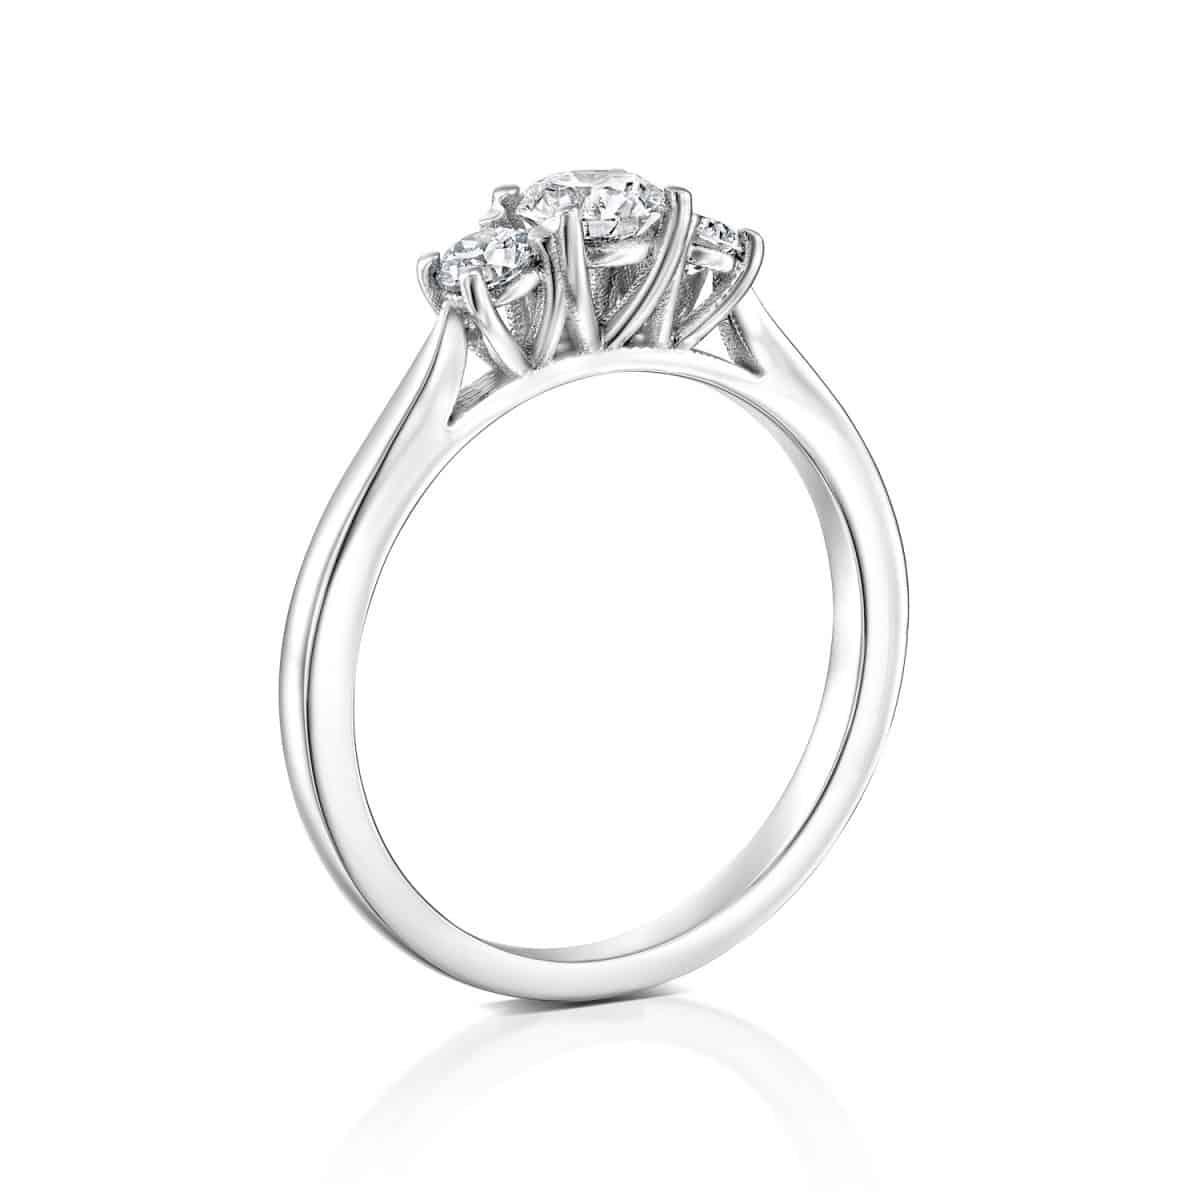 Bar - White Gold Lab Grown Diamond Engagement Ring 0.50ct. - side